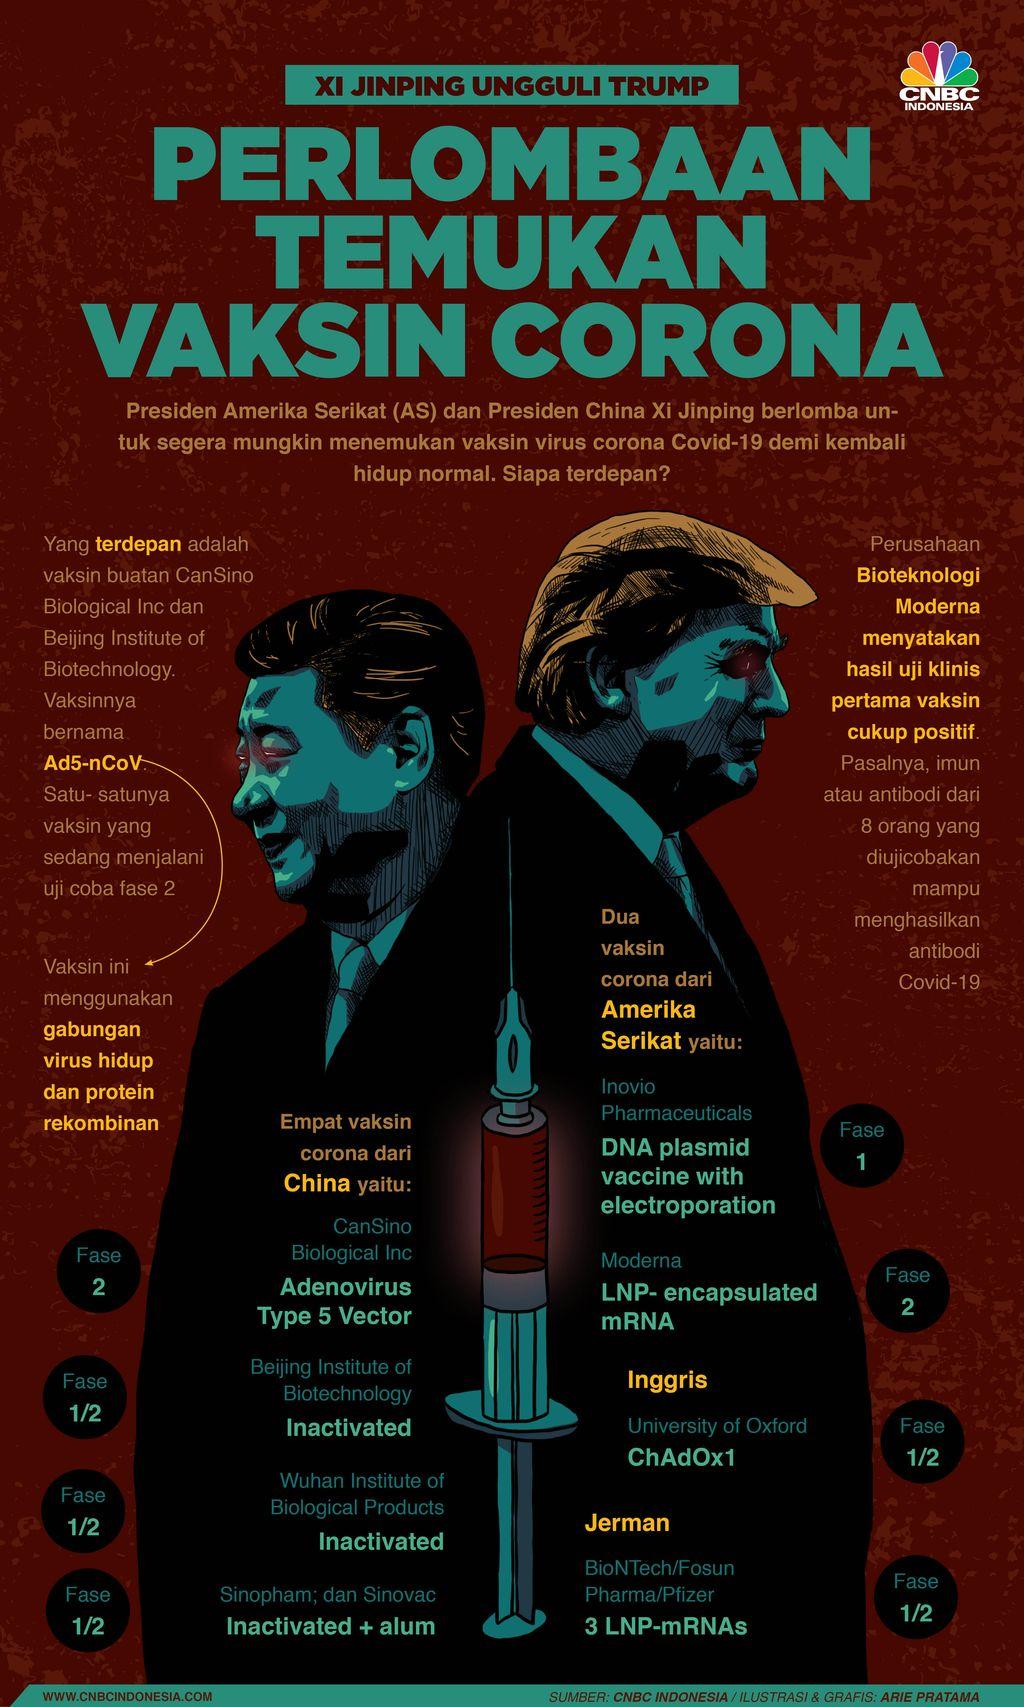 Infografis: Perlombaan Temukan Vaksin Corona: Xi Jinping Ungguli Trump